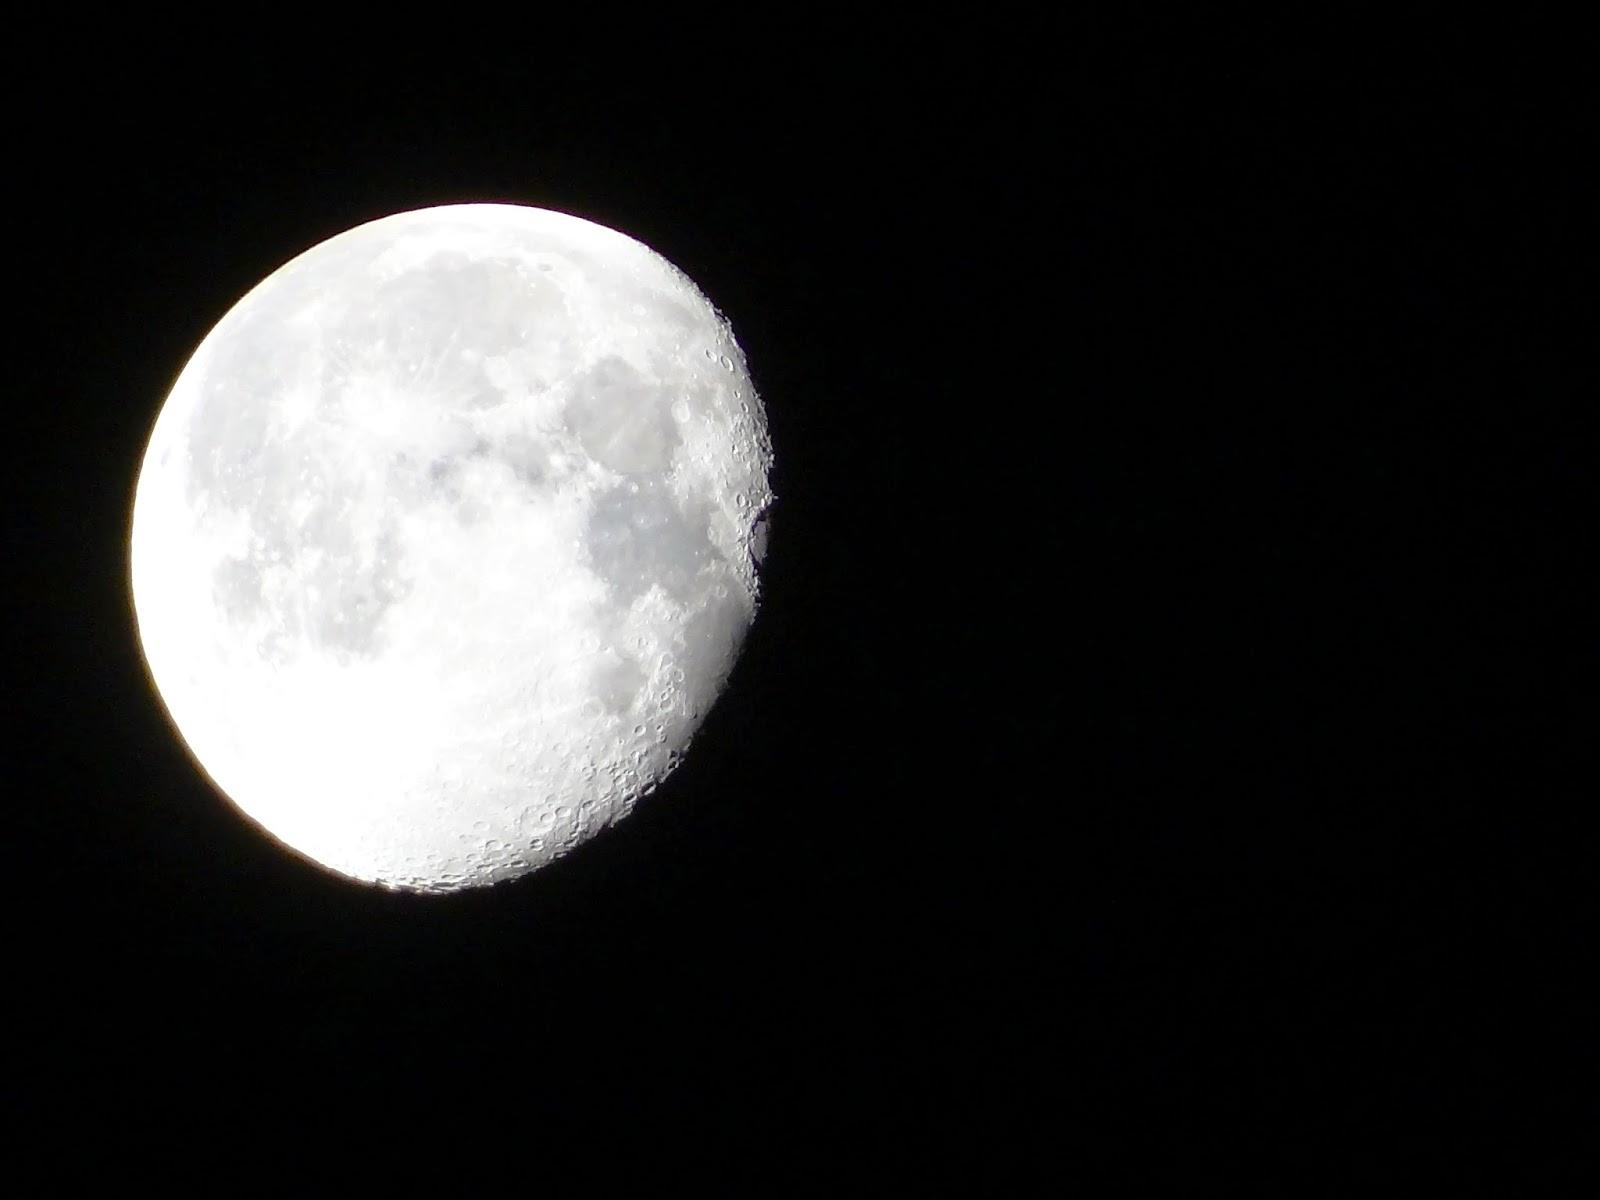 asturias luna llena full moon